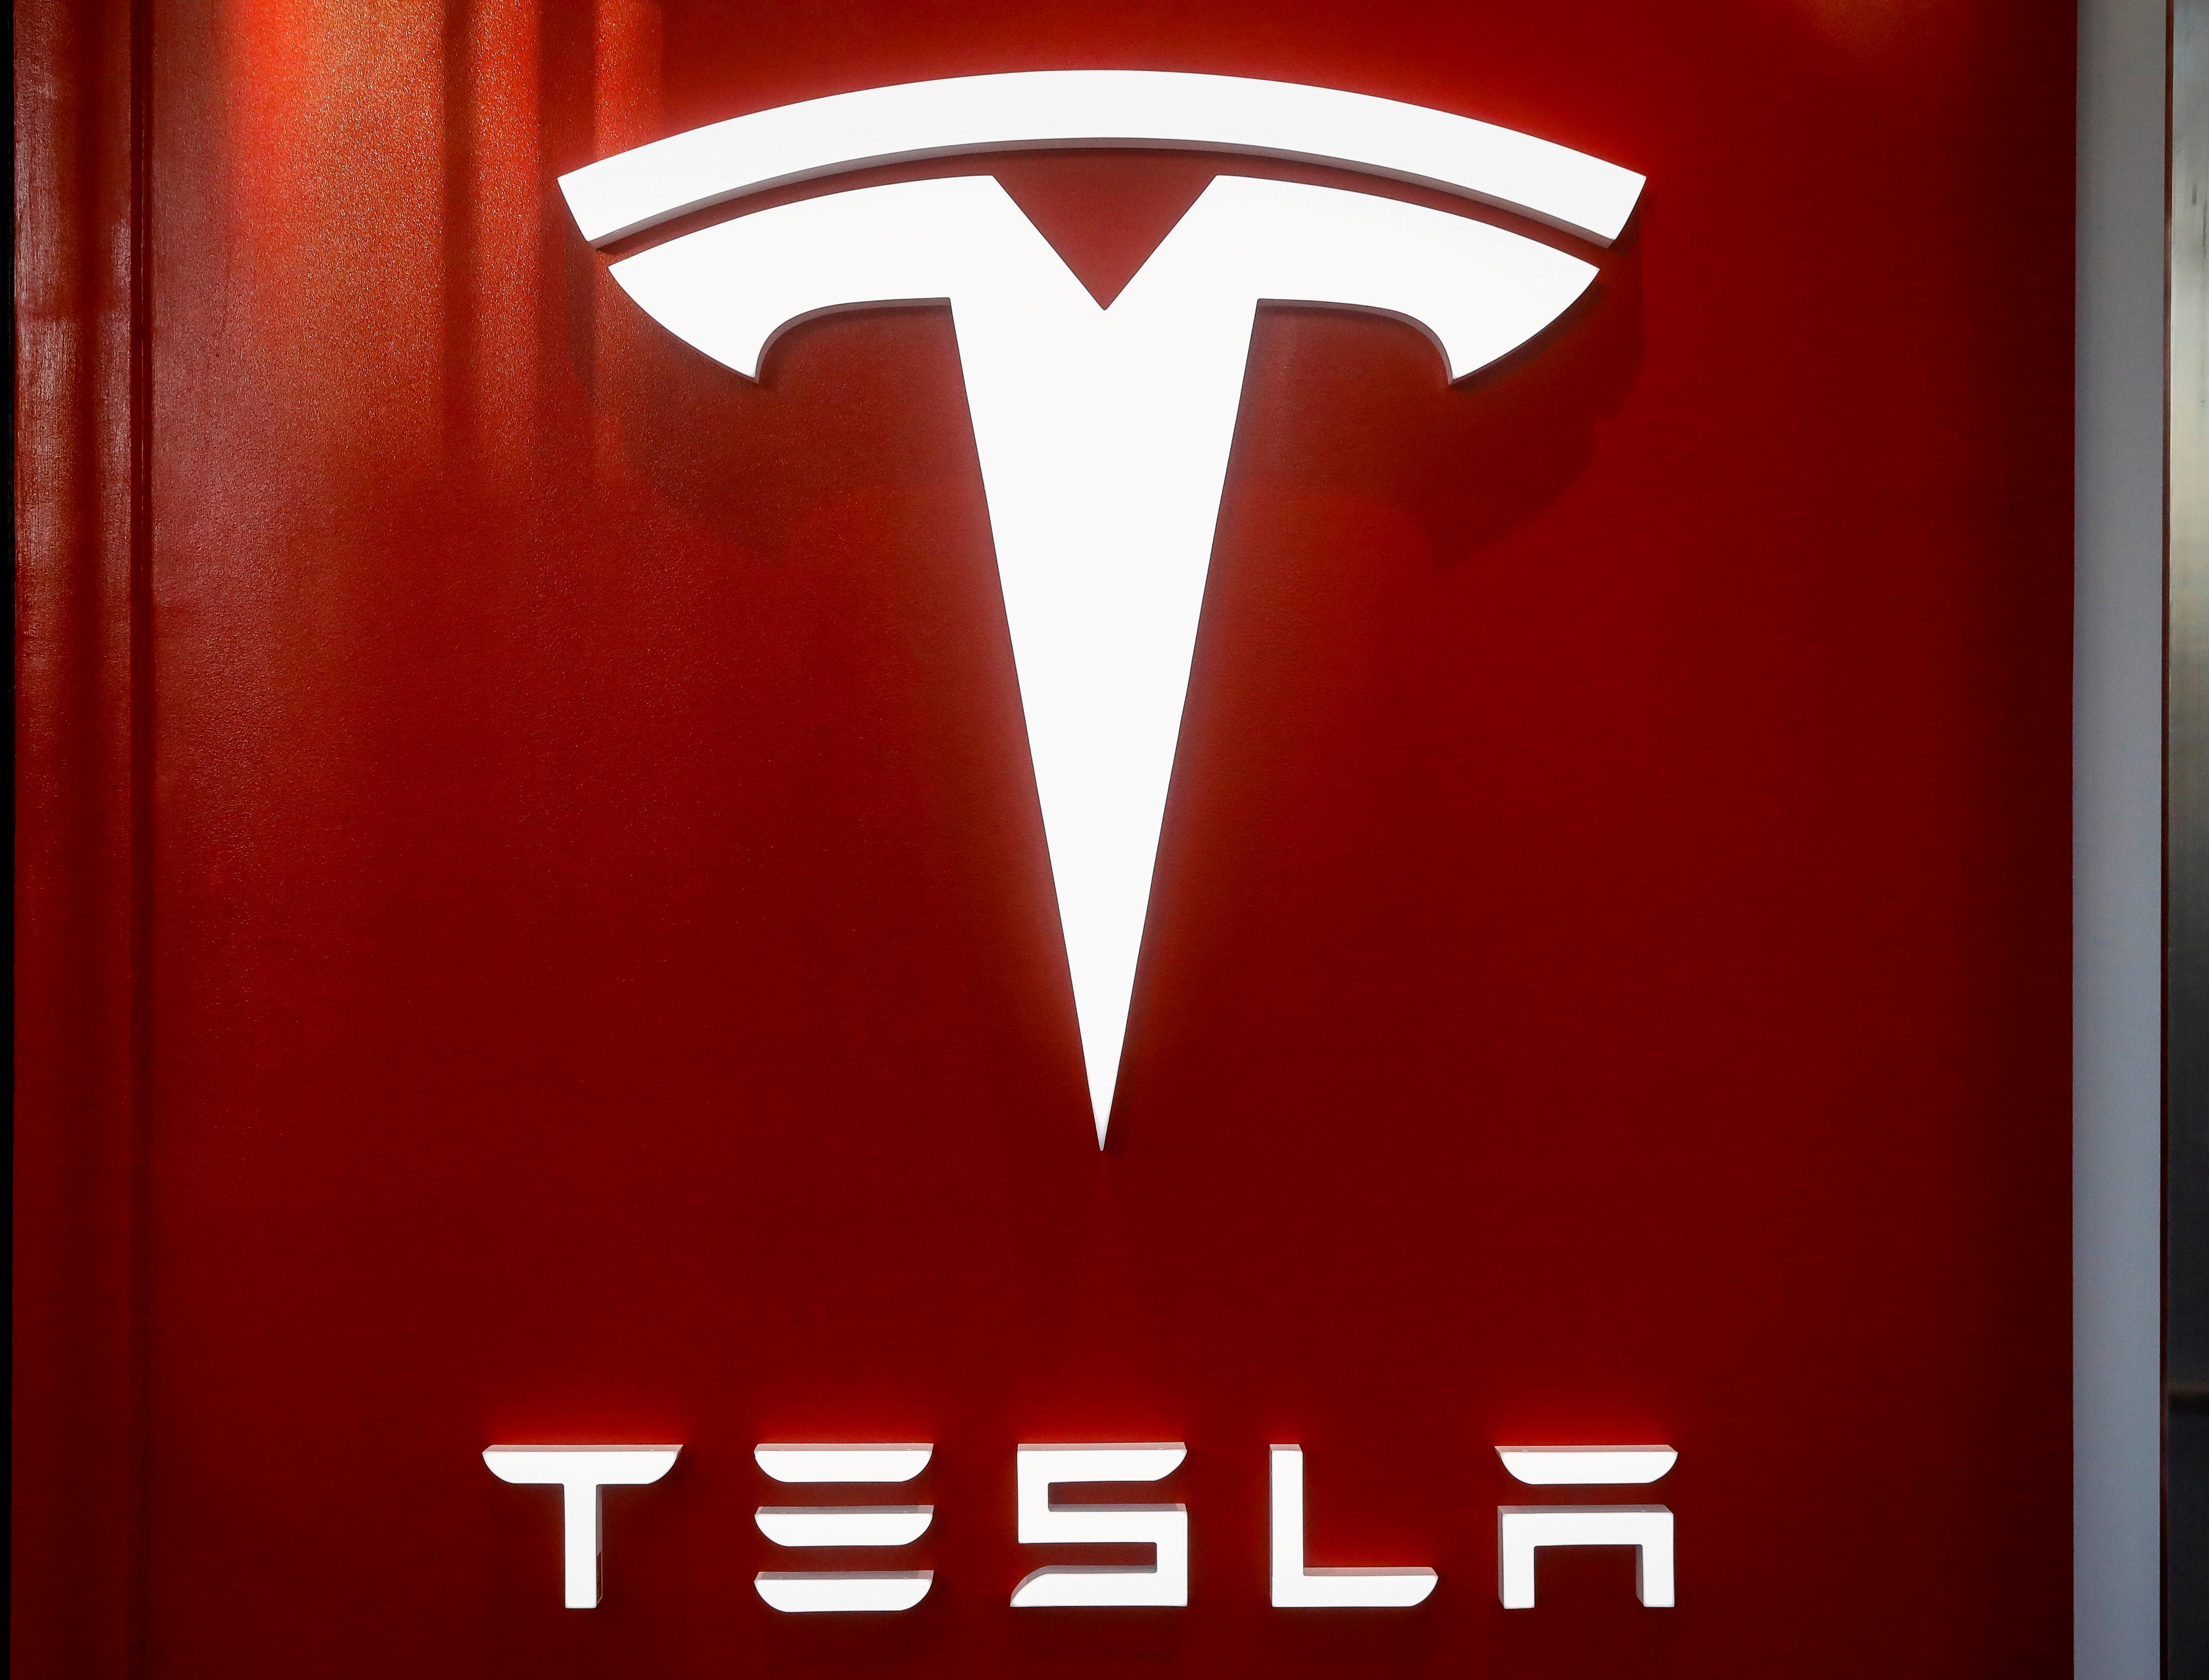 The Tesla logo is seen at the entrance to Tesla Motors' showroom in Manhattan's Meatpacking District in New York City, U.S., December 14, 2017. REUTERS/Brendan McDermid/File Photo